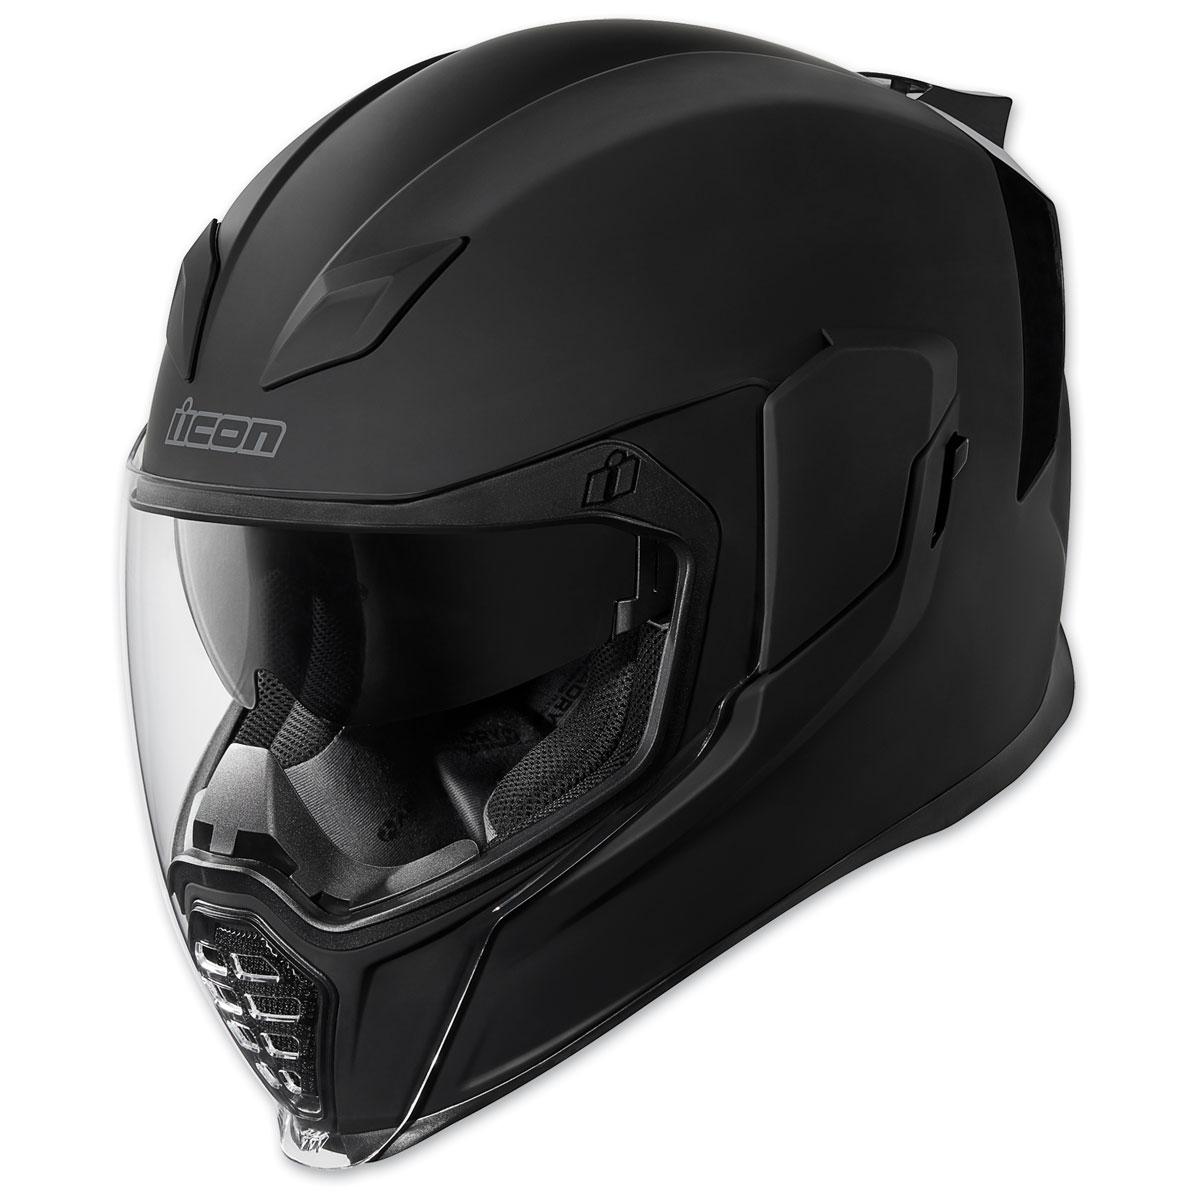 ICON Airflite Rubatone Black Full Face Helmet